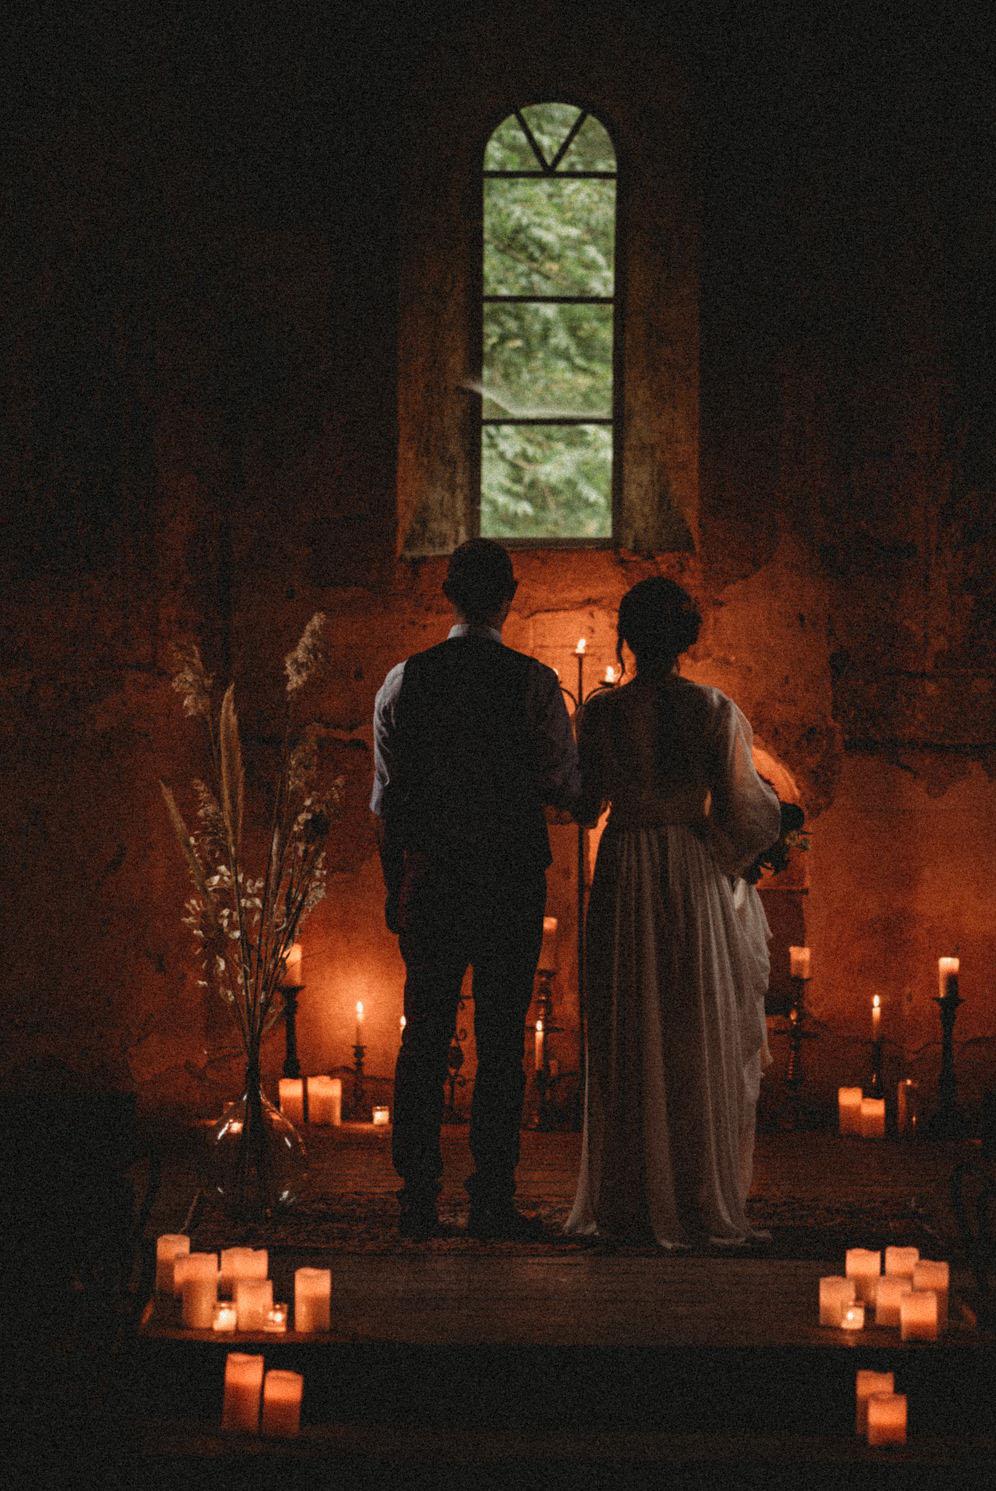 Romantic candlelight ceremony